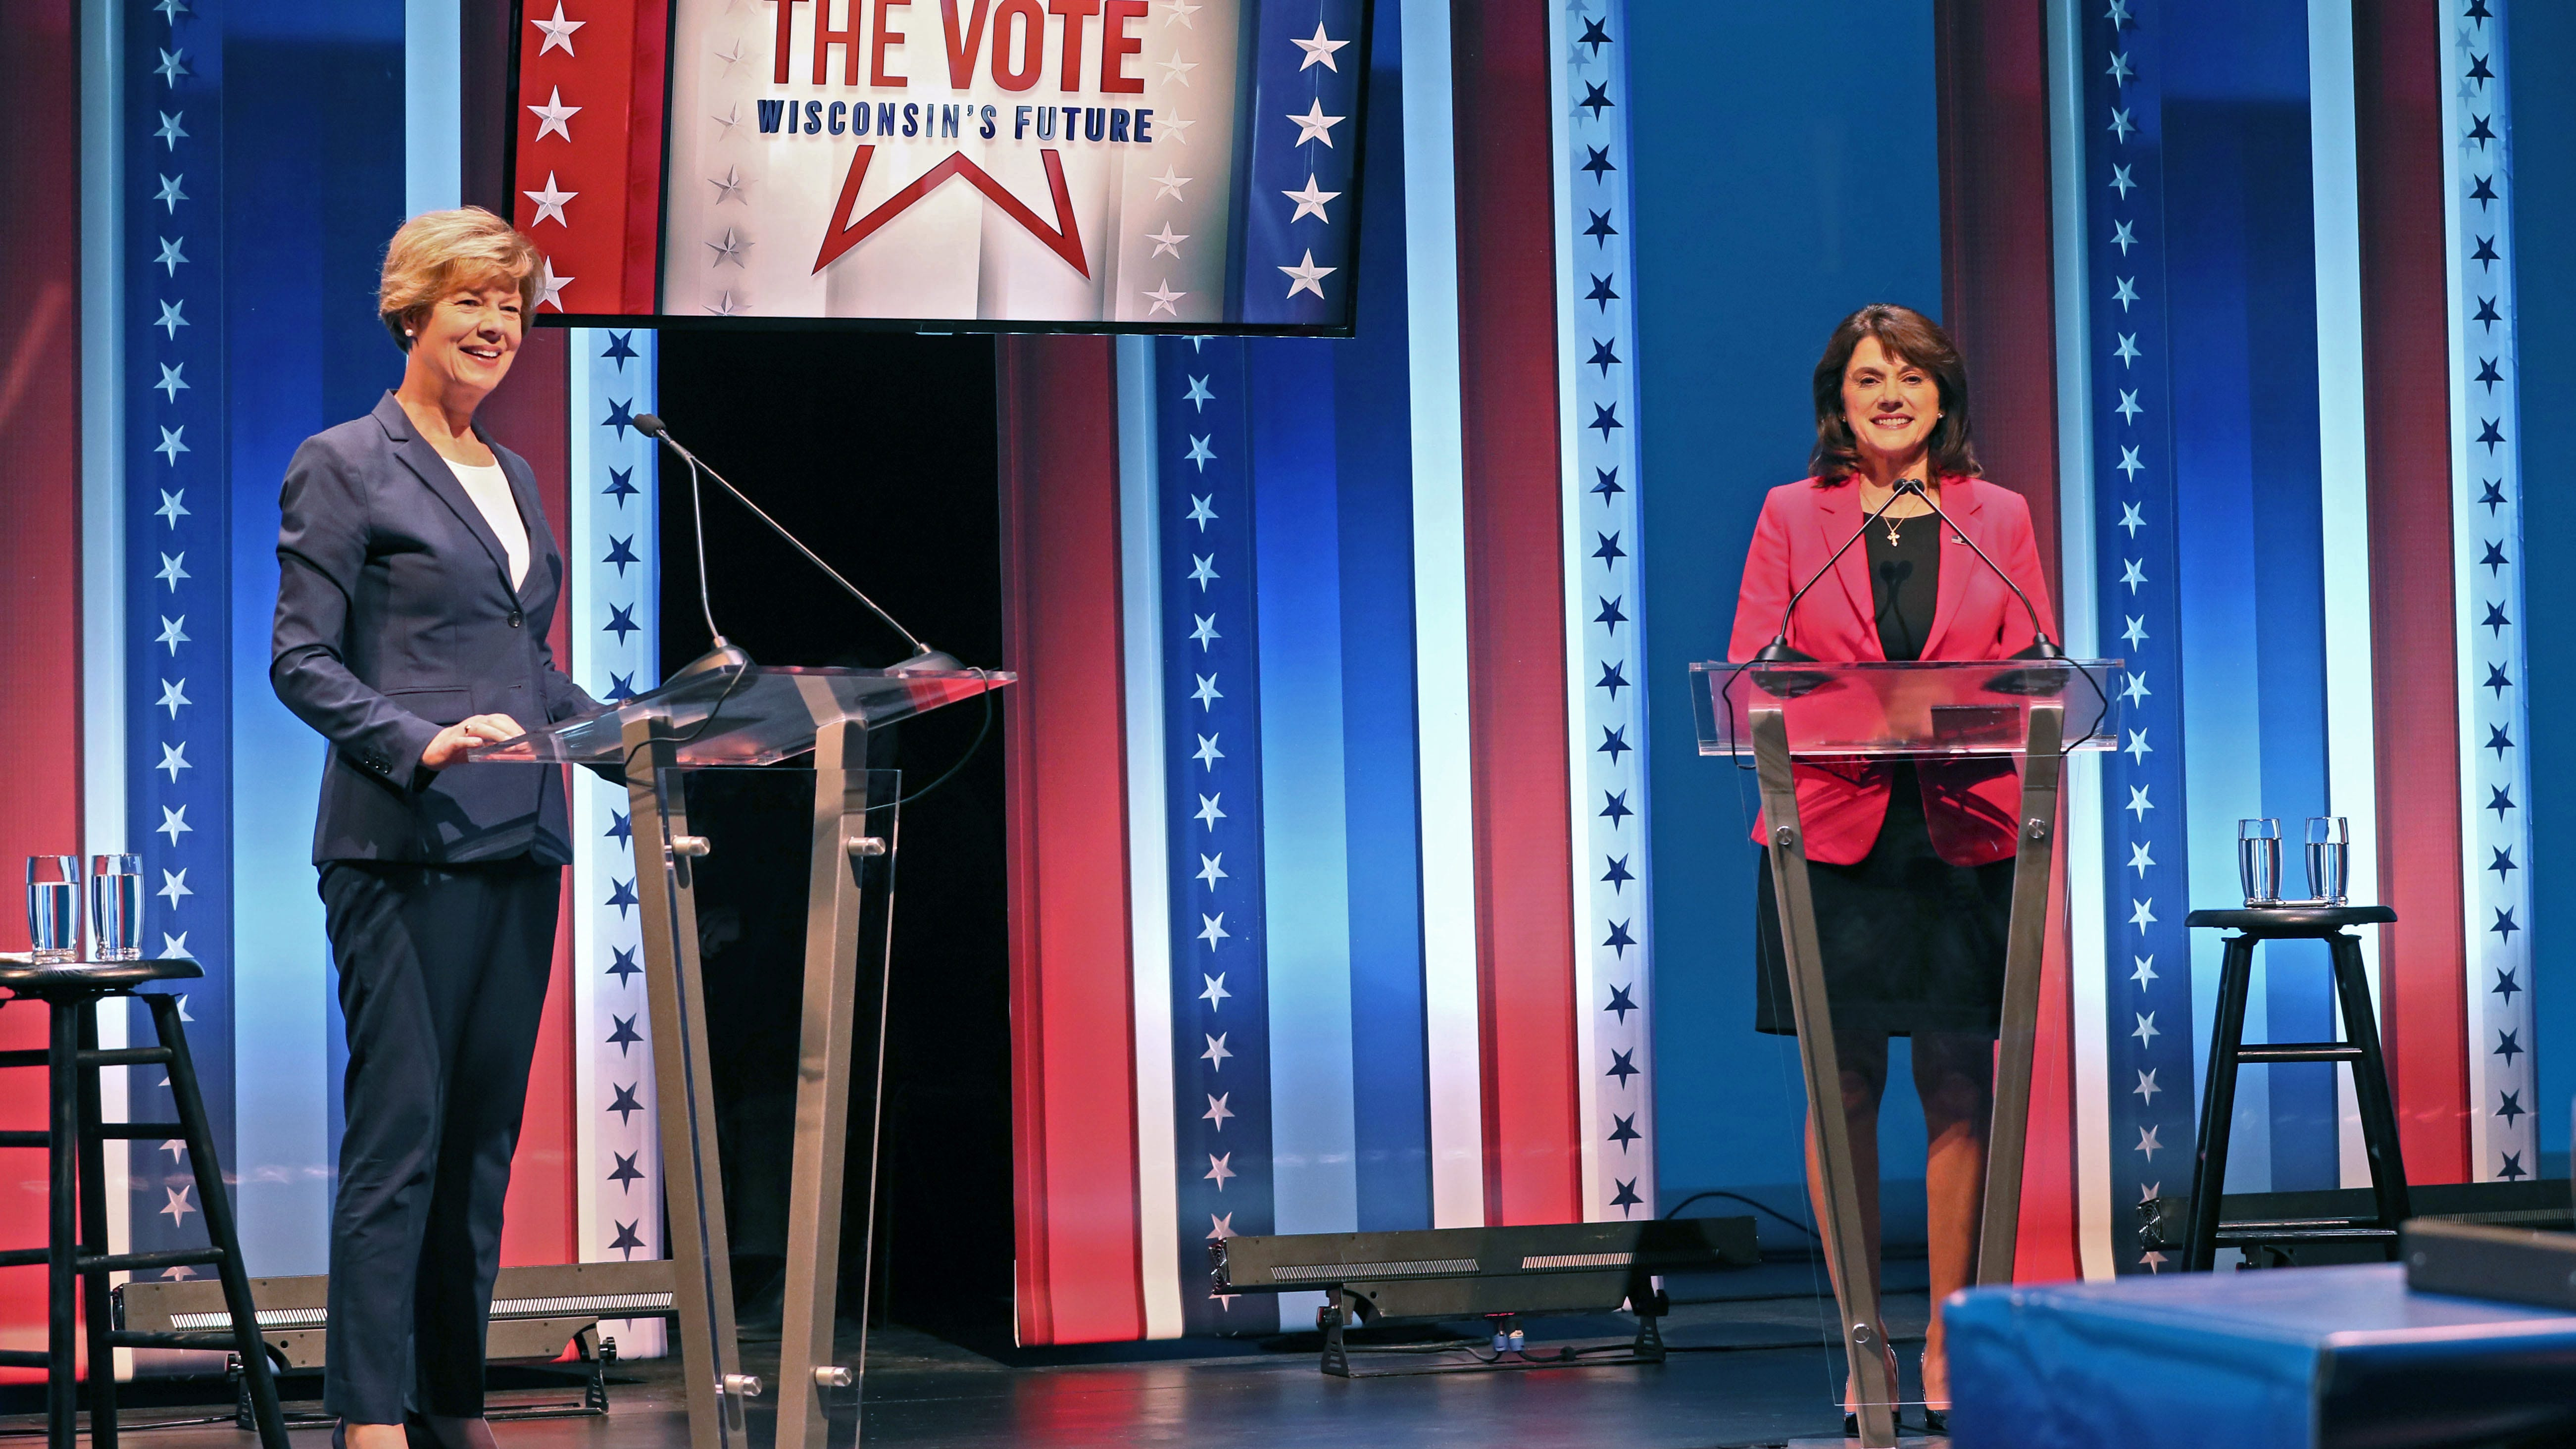 We made a bingo card for Saturday's U.S. Senate debate. Play along!